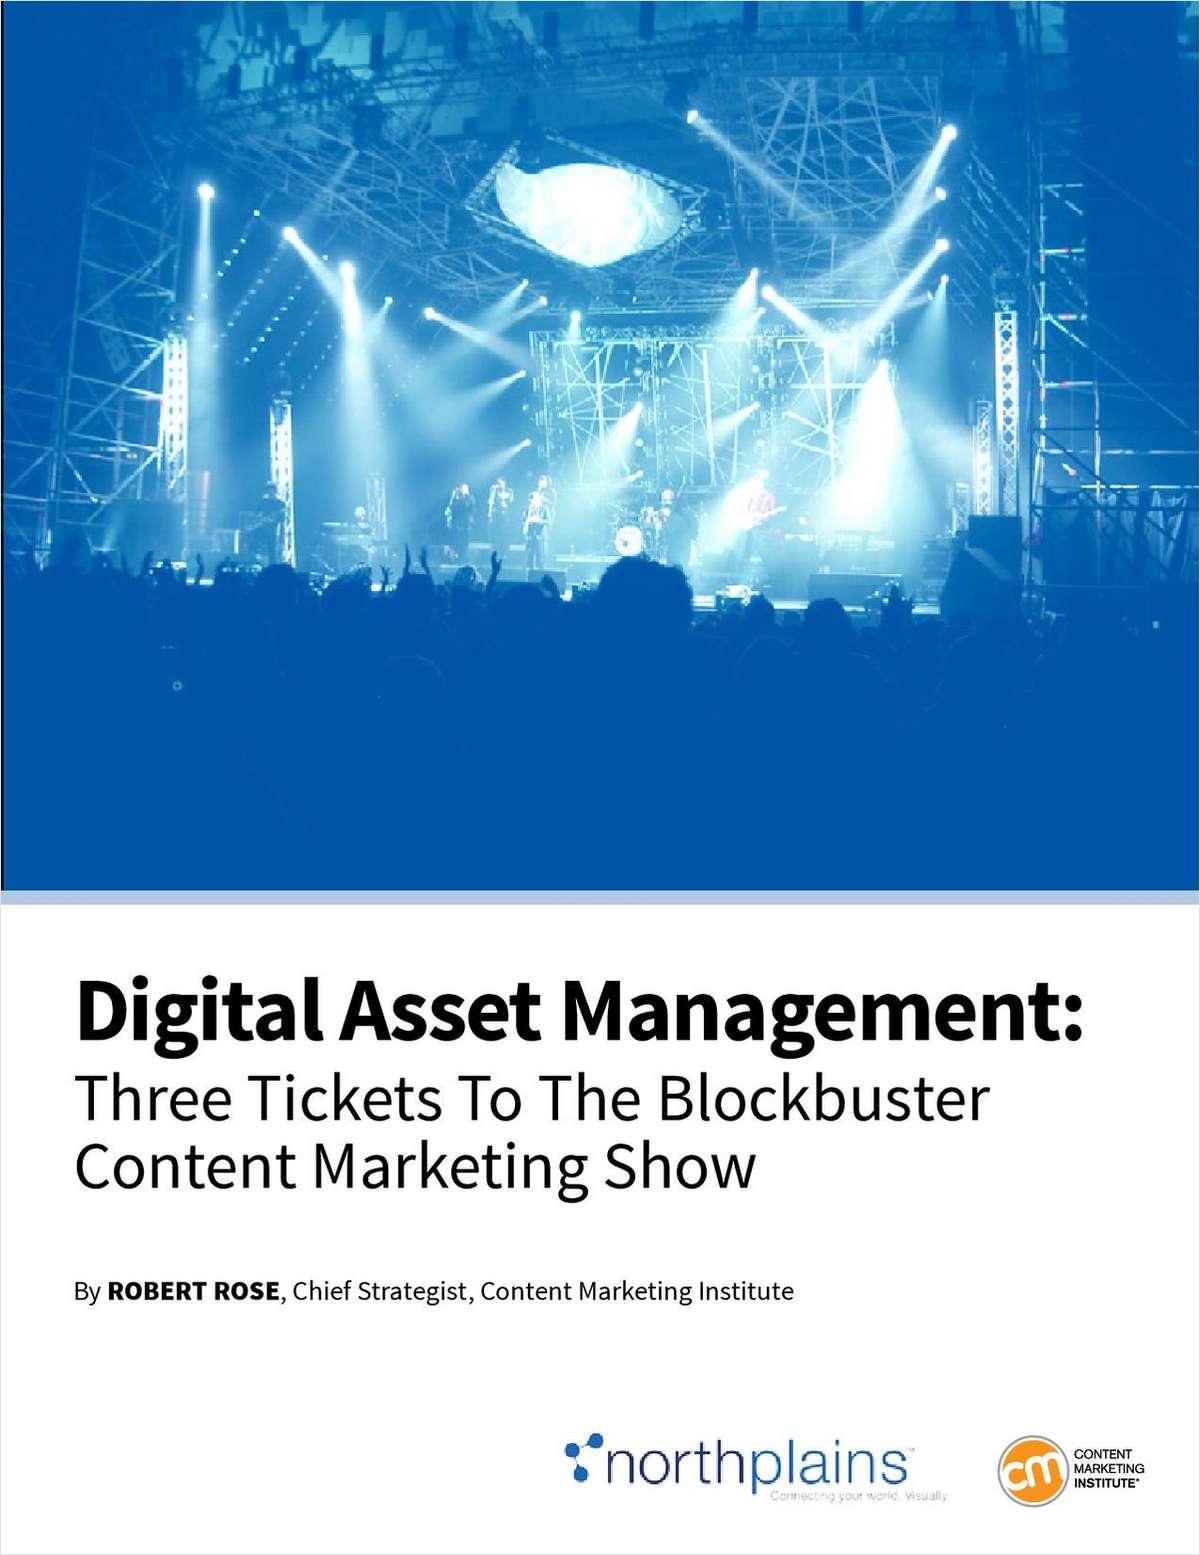 Digital Asset Management: The Three-Step Best Practice Model